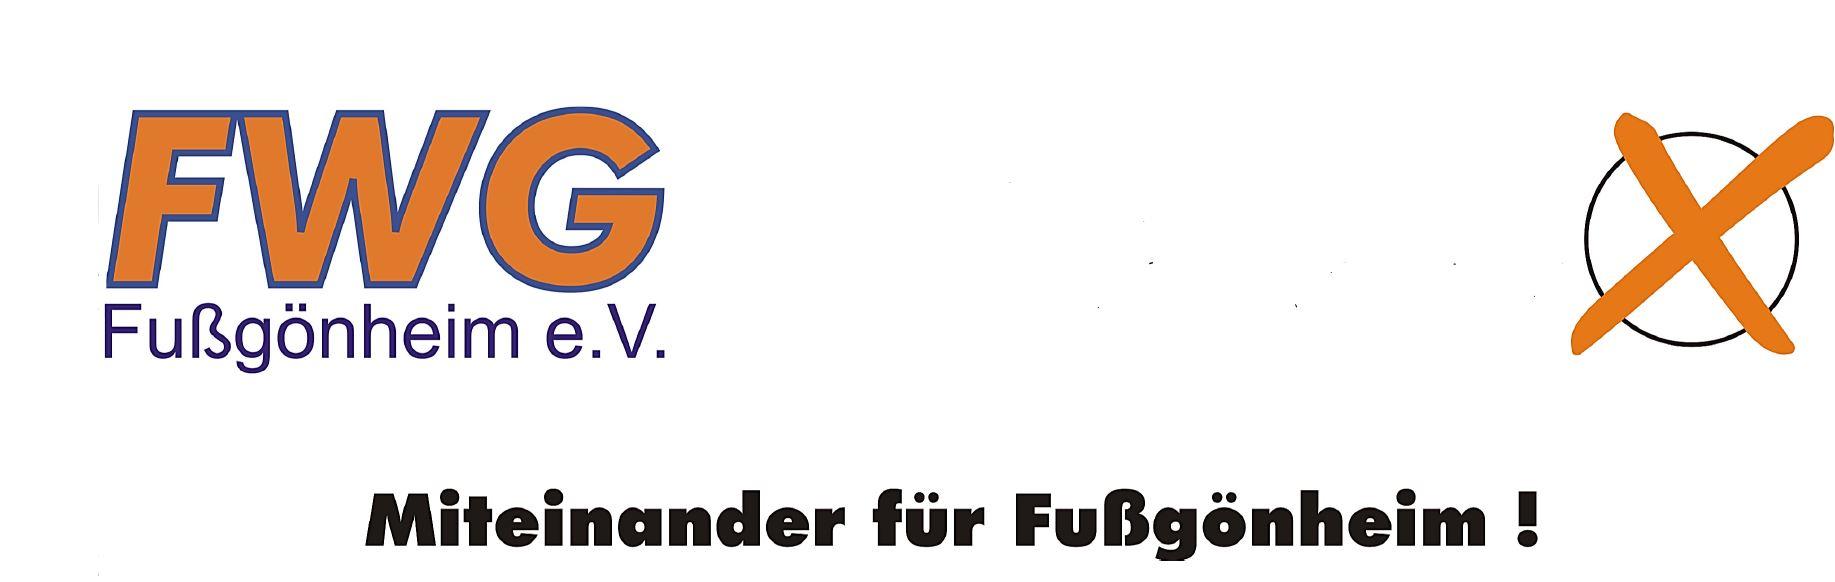 FWG Fußgönheim e.V.